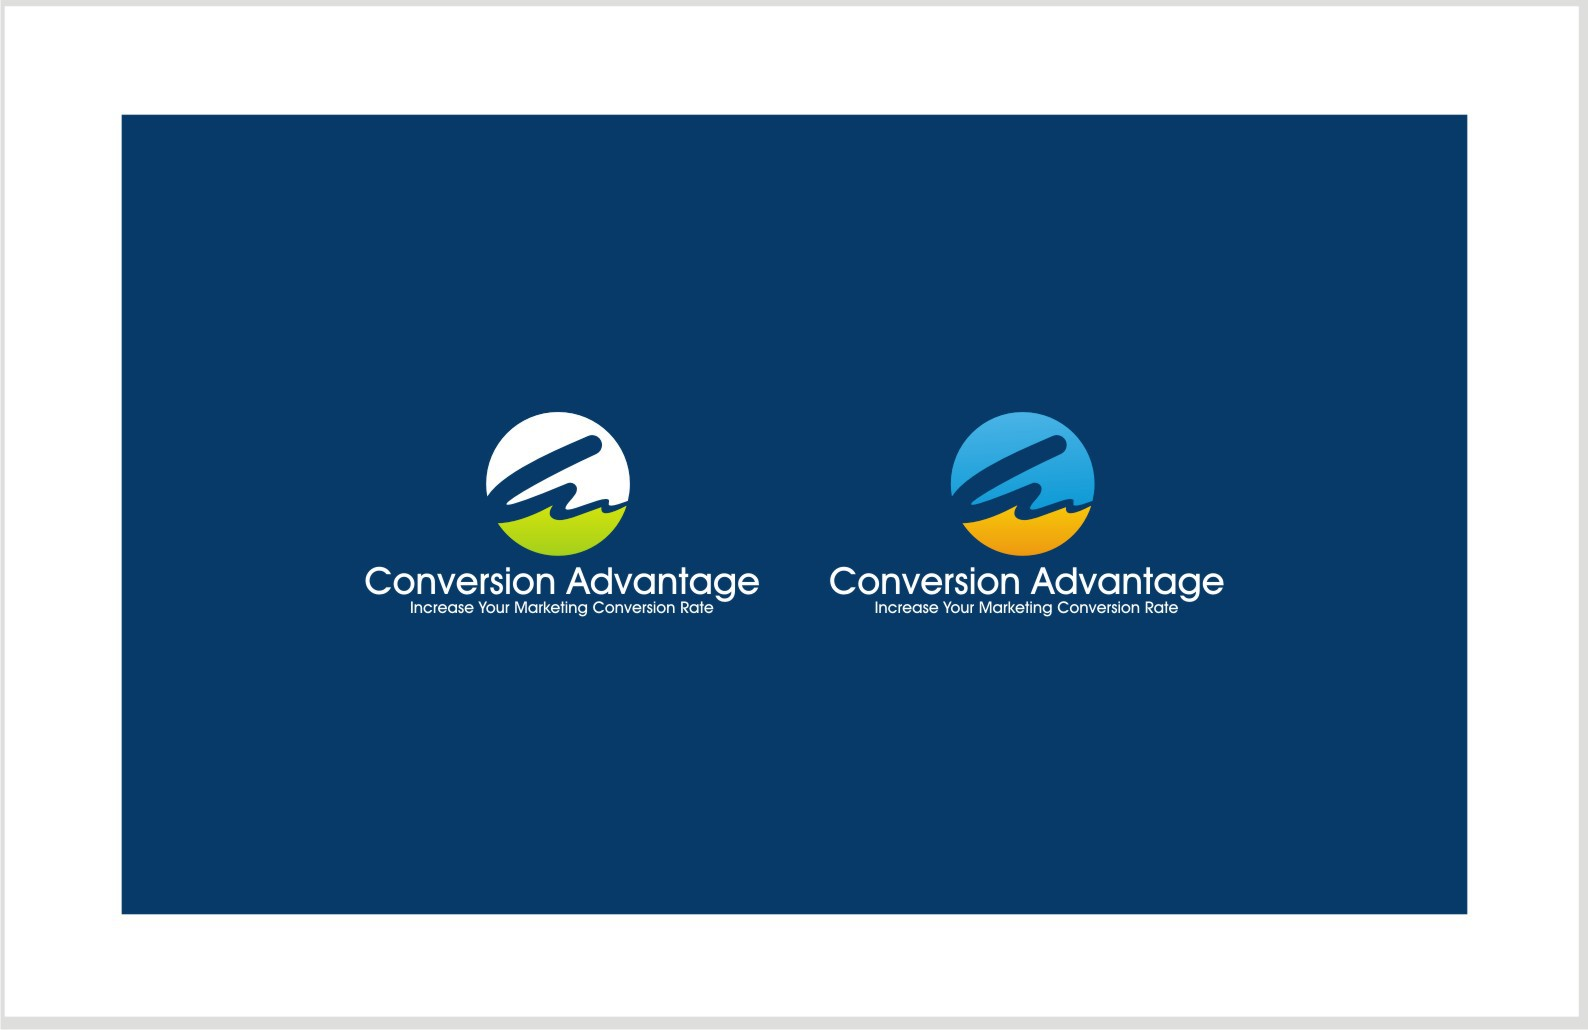 Help Conversion Advantage with a new logo